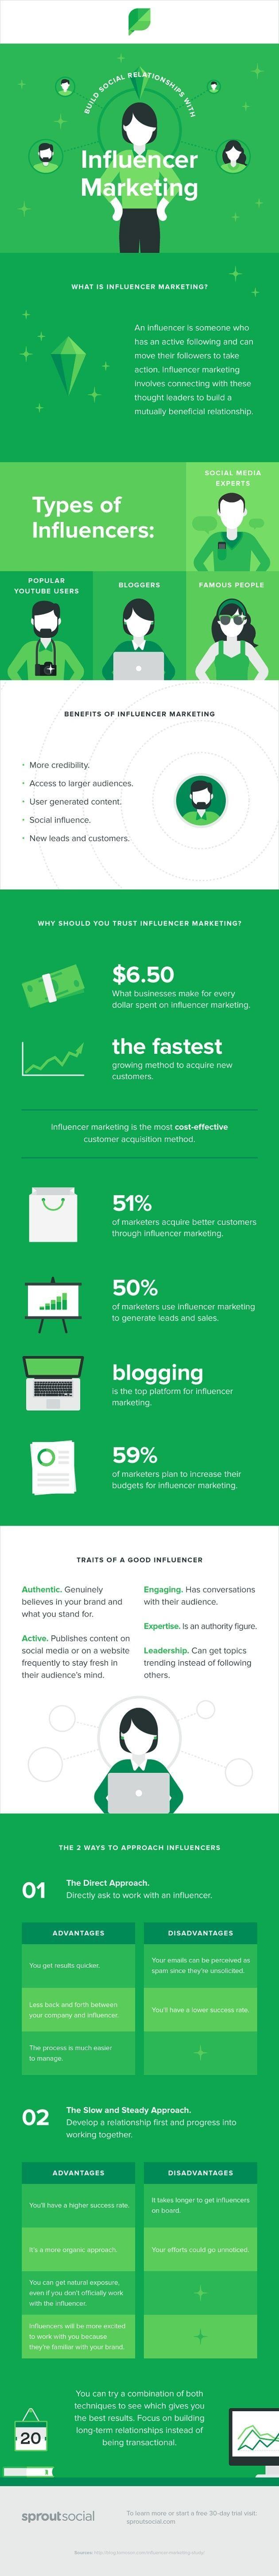 #Marketing Strategy! #Web #SocialMedia #Business #Entrepreneur #Startup #Content #Digital #Tech #Success